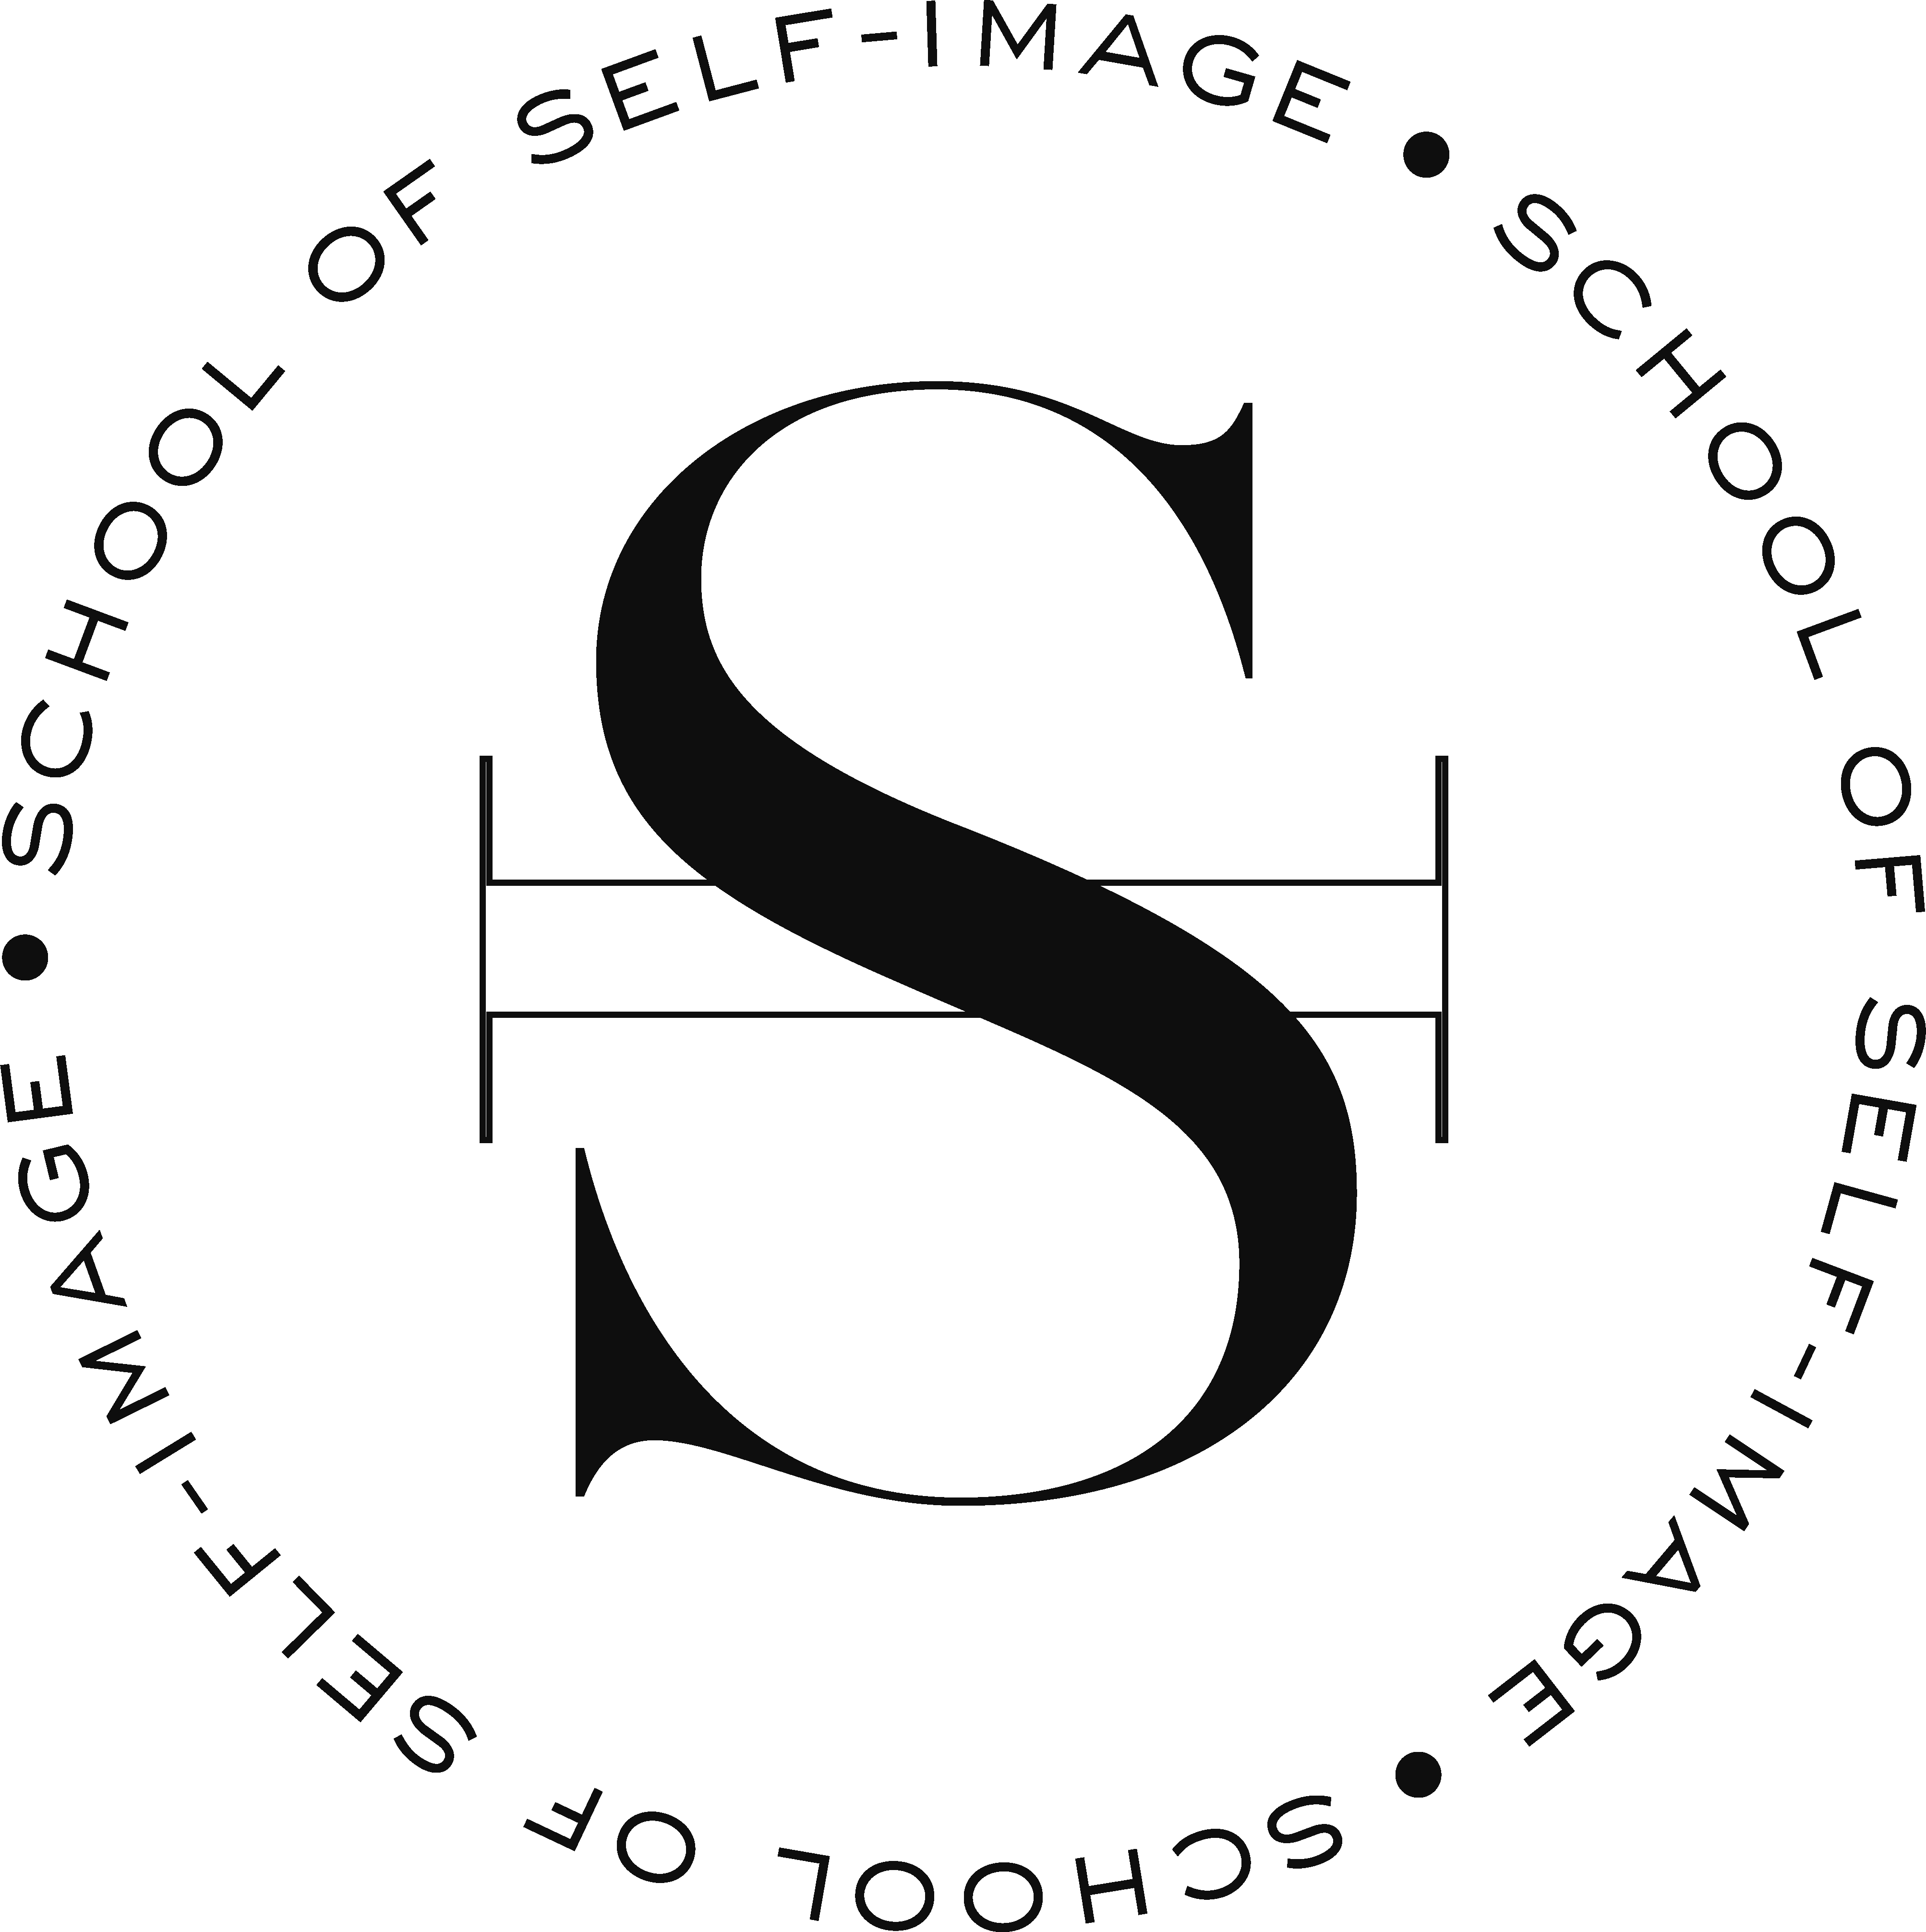 School of Self-Image